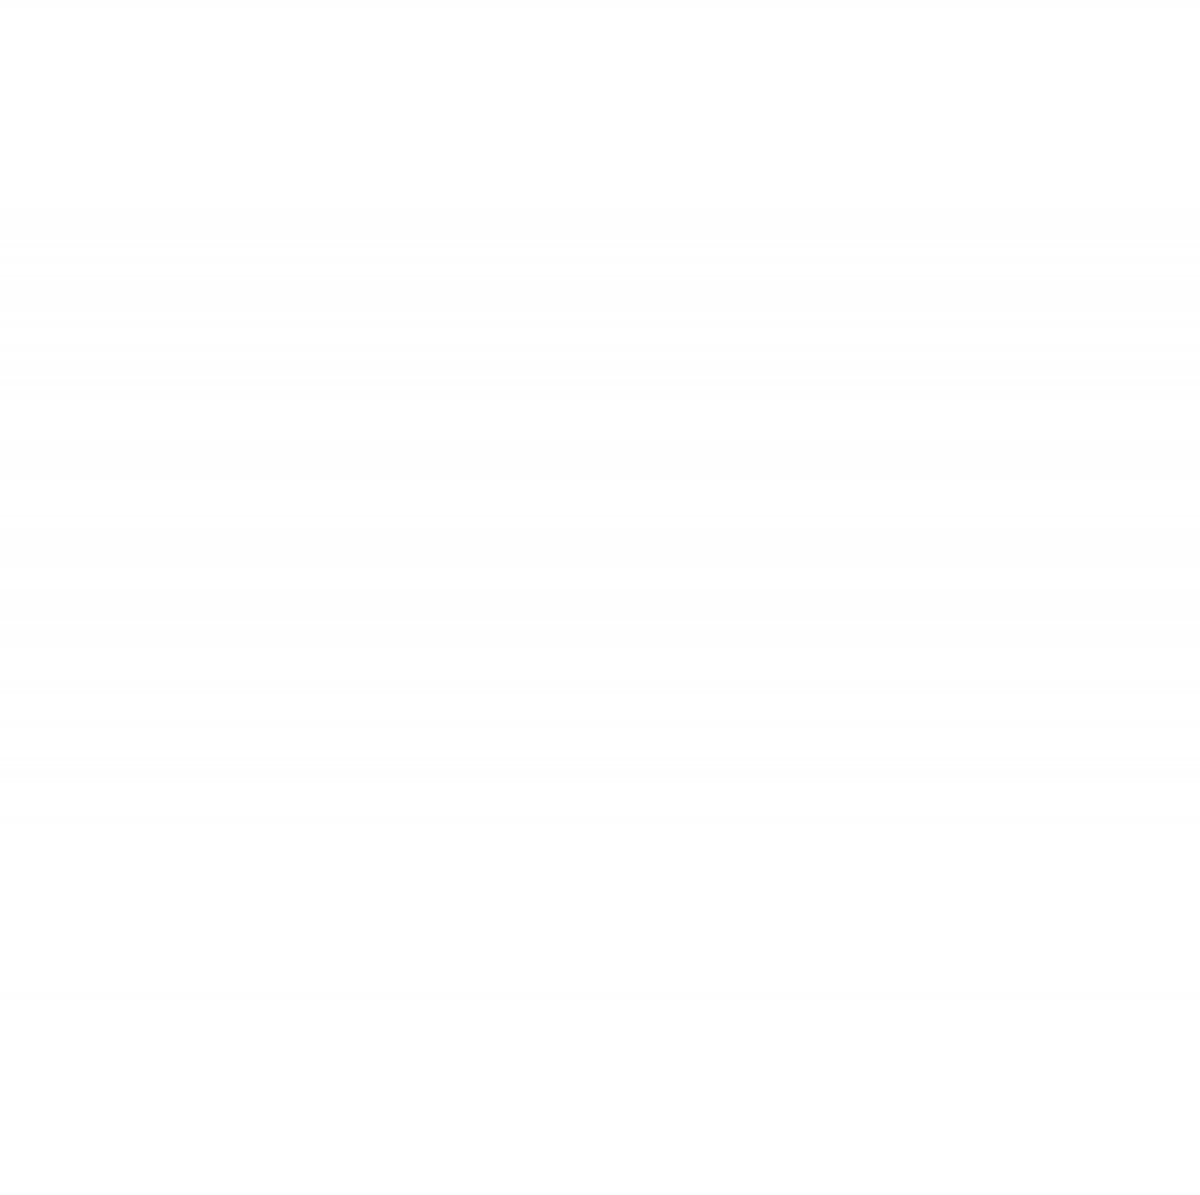 misserif.blogspot.com — John Downer's iconic script logo for Emigre.